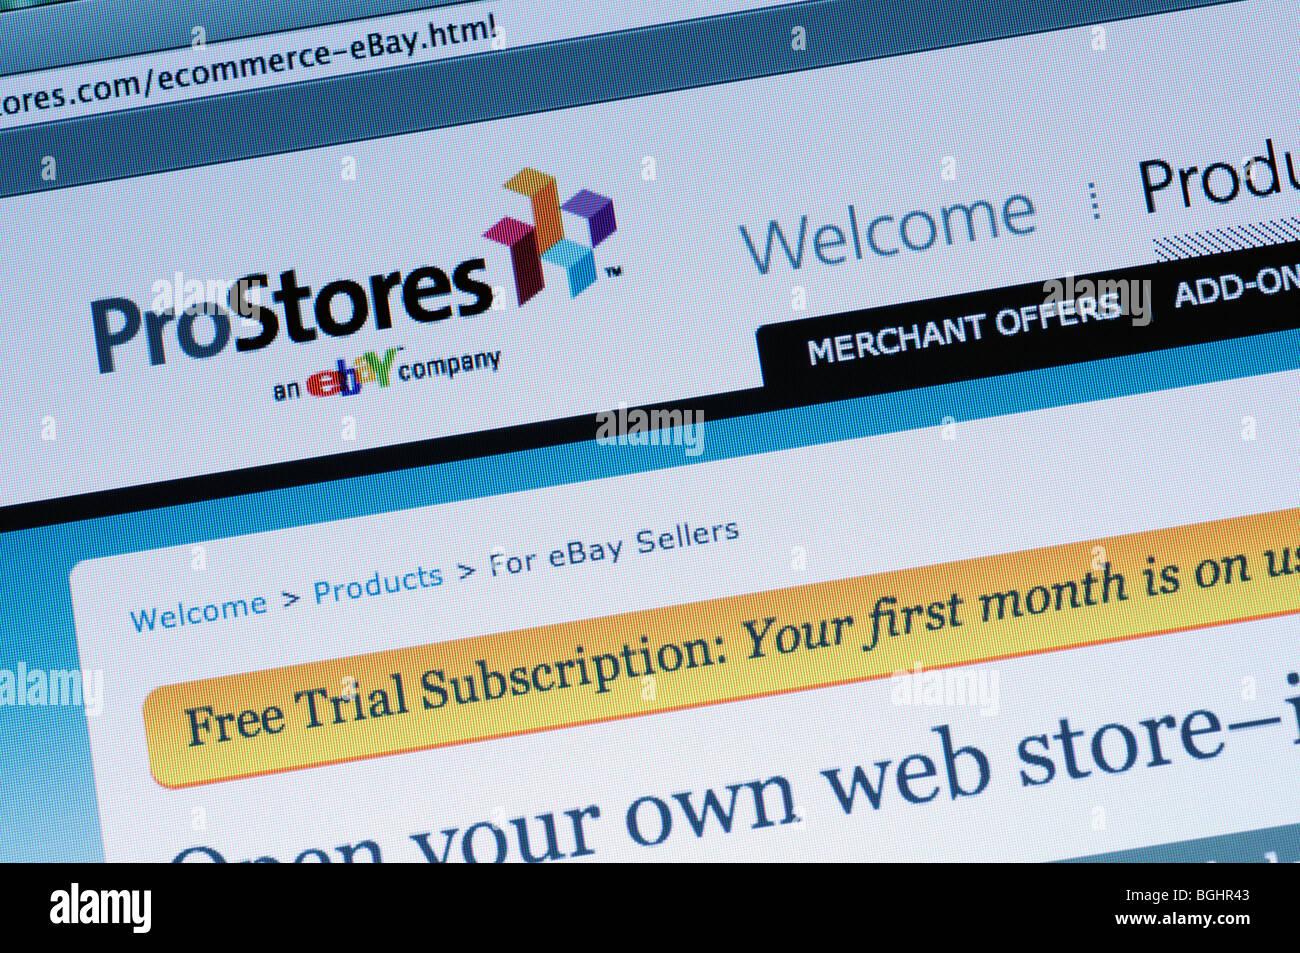 ProStores website - Stock Image